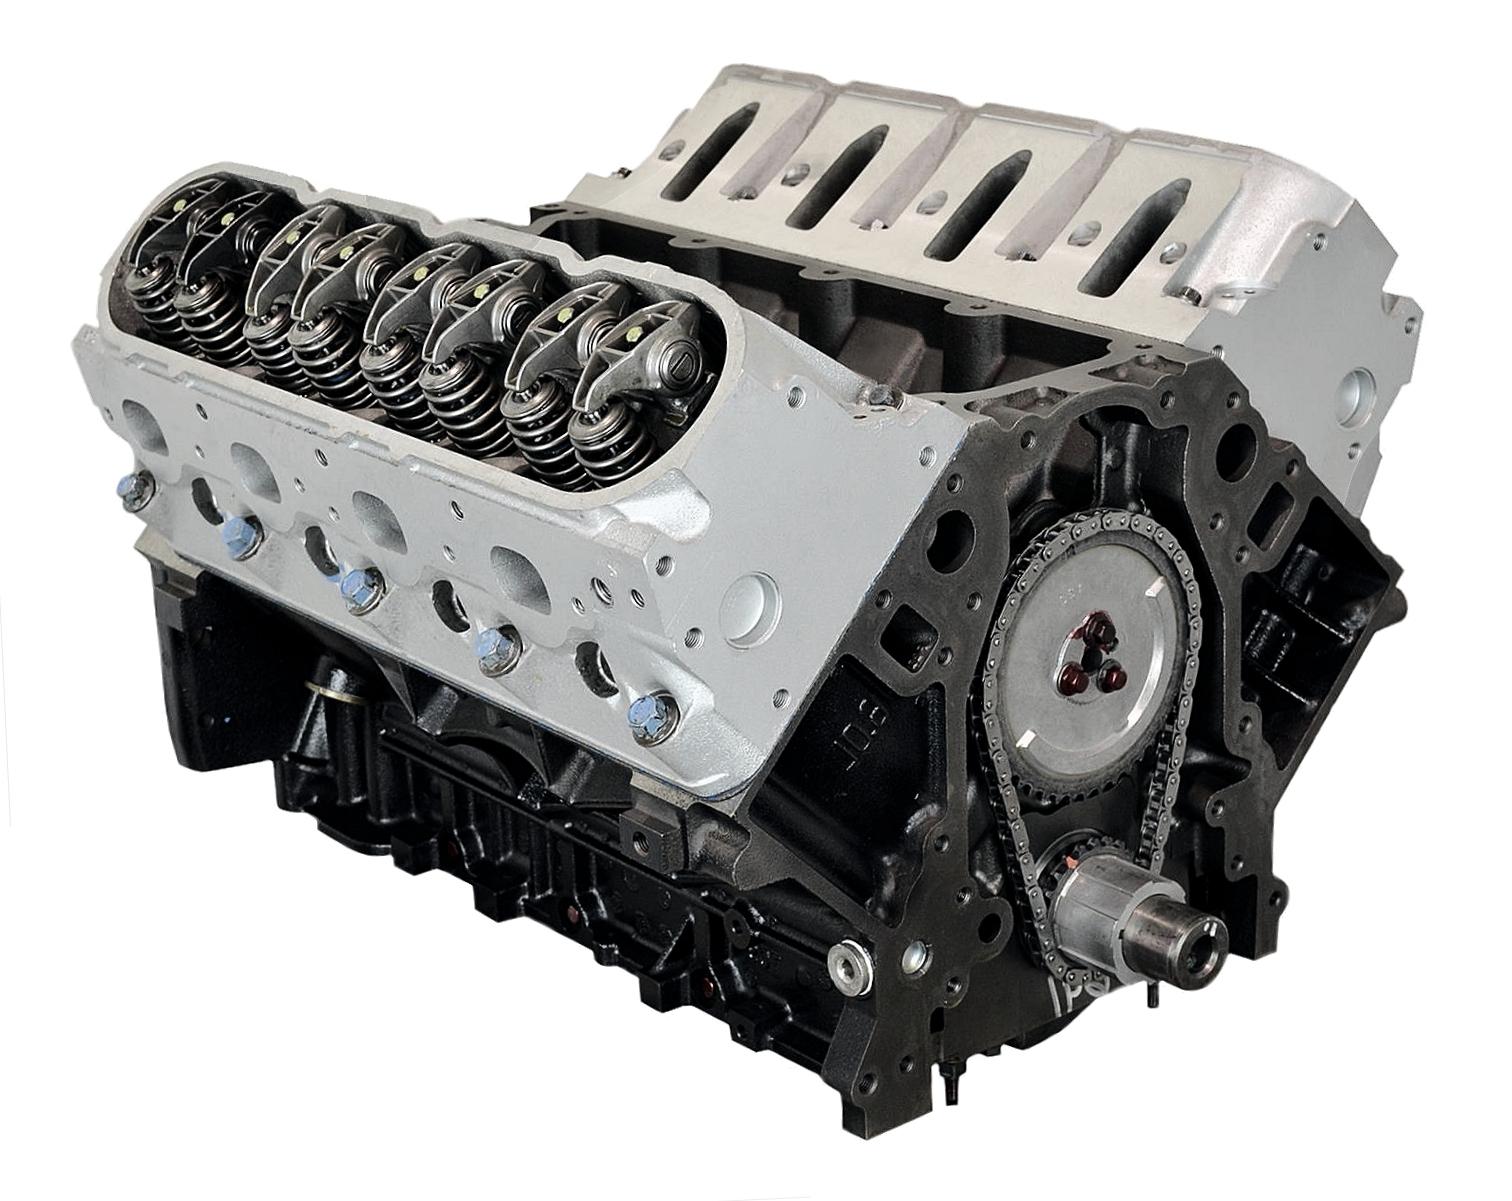 Chevrolet Suburban 1500 - 5.3 L59 Engine - 2002-2006 (Vin Code: Z)